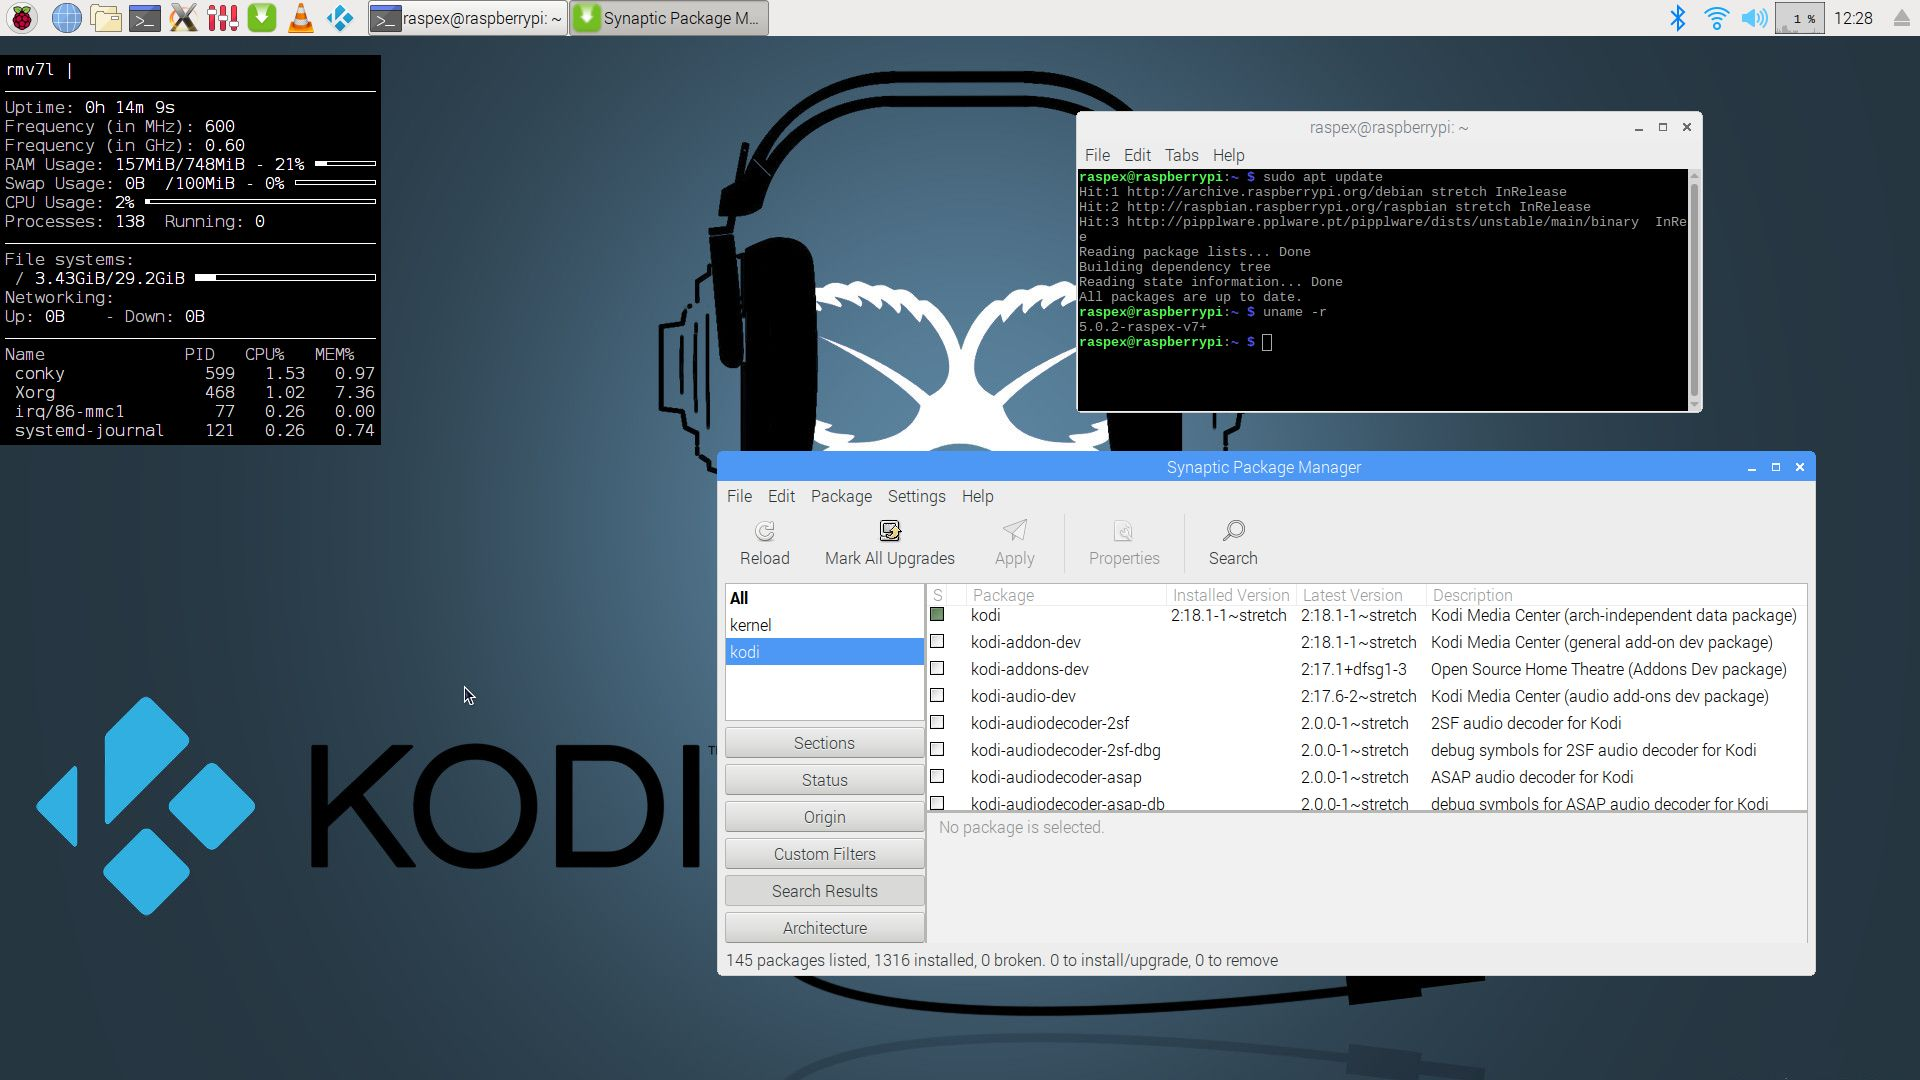 RaspEX Project Brings Kodi 18 1 and Linux Kernel 5 0 to